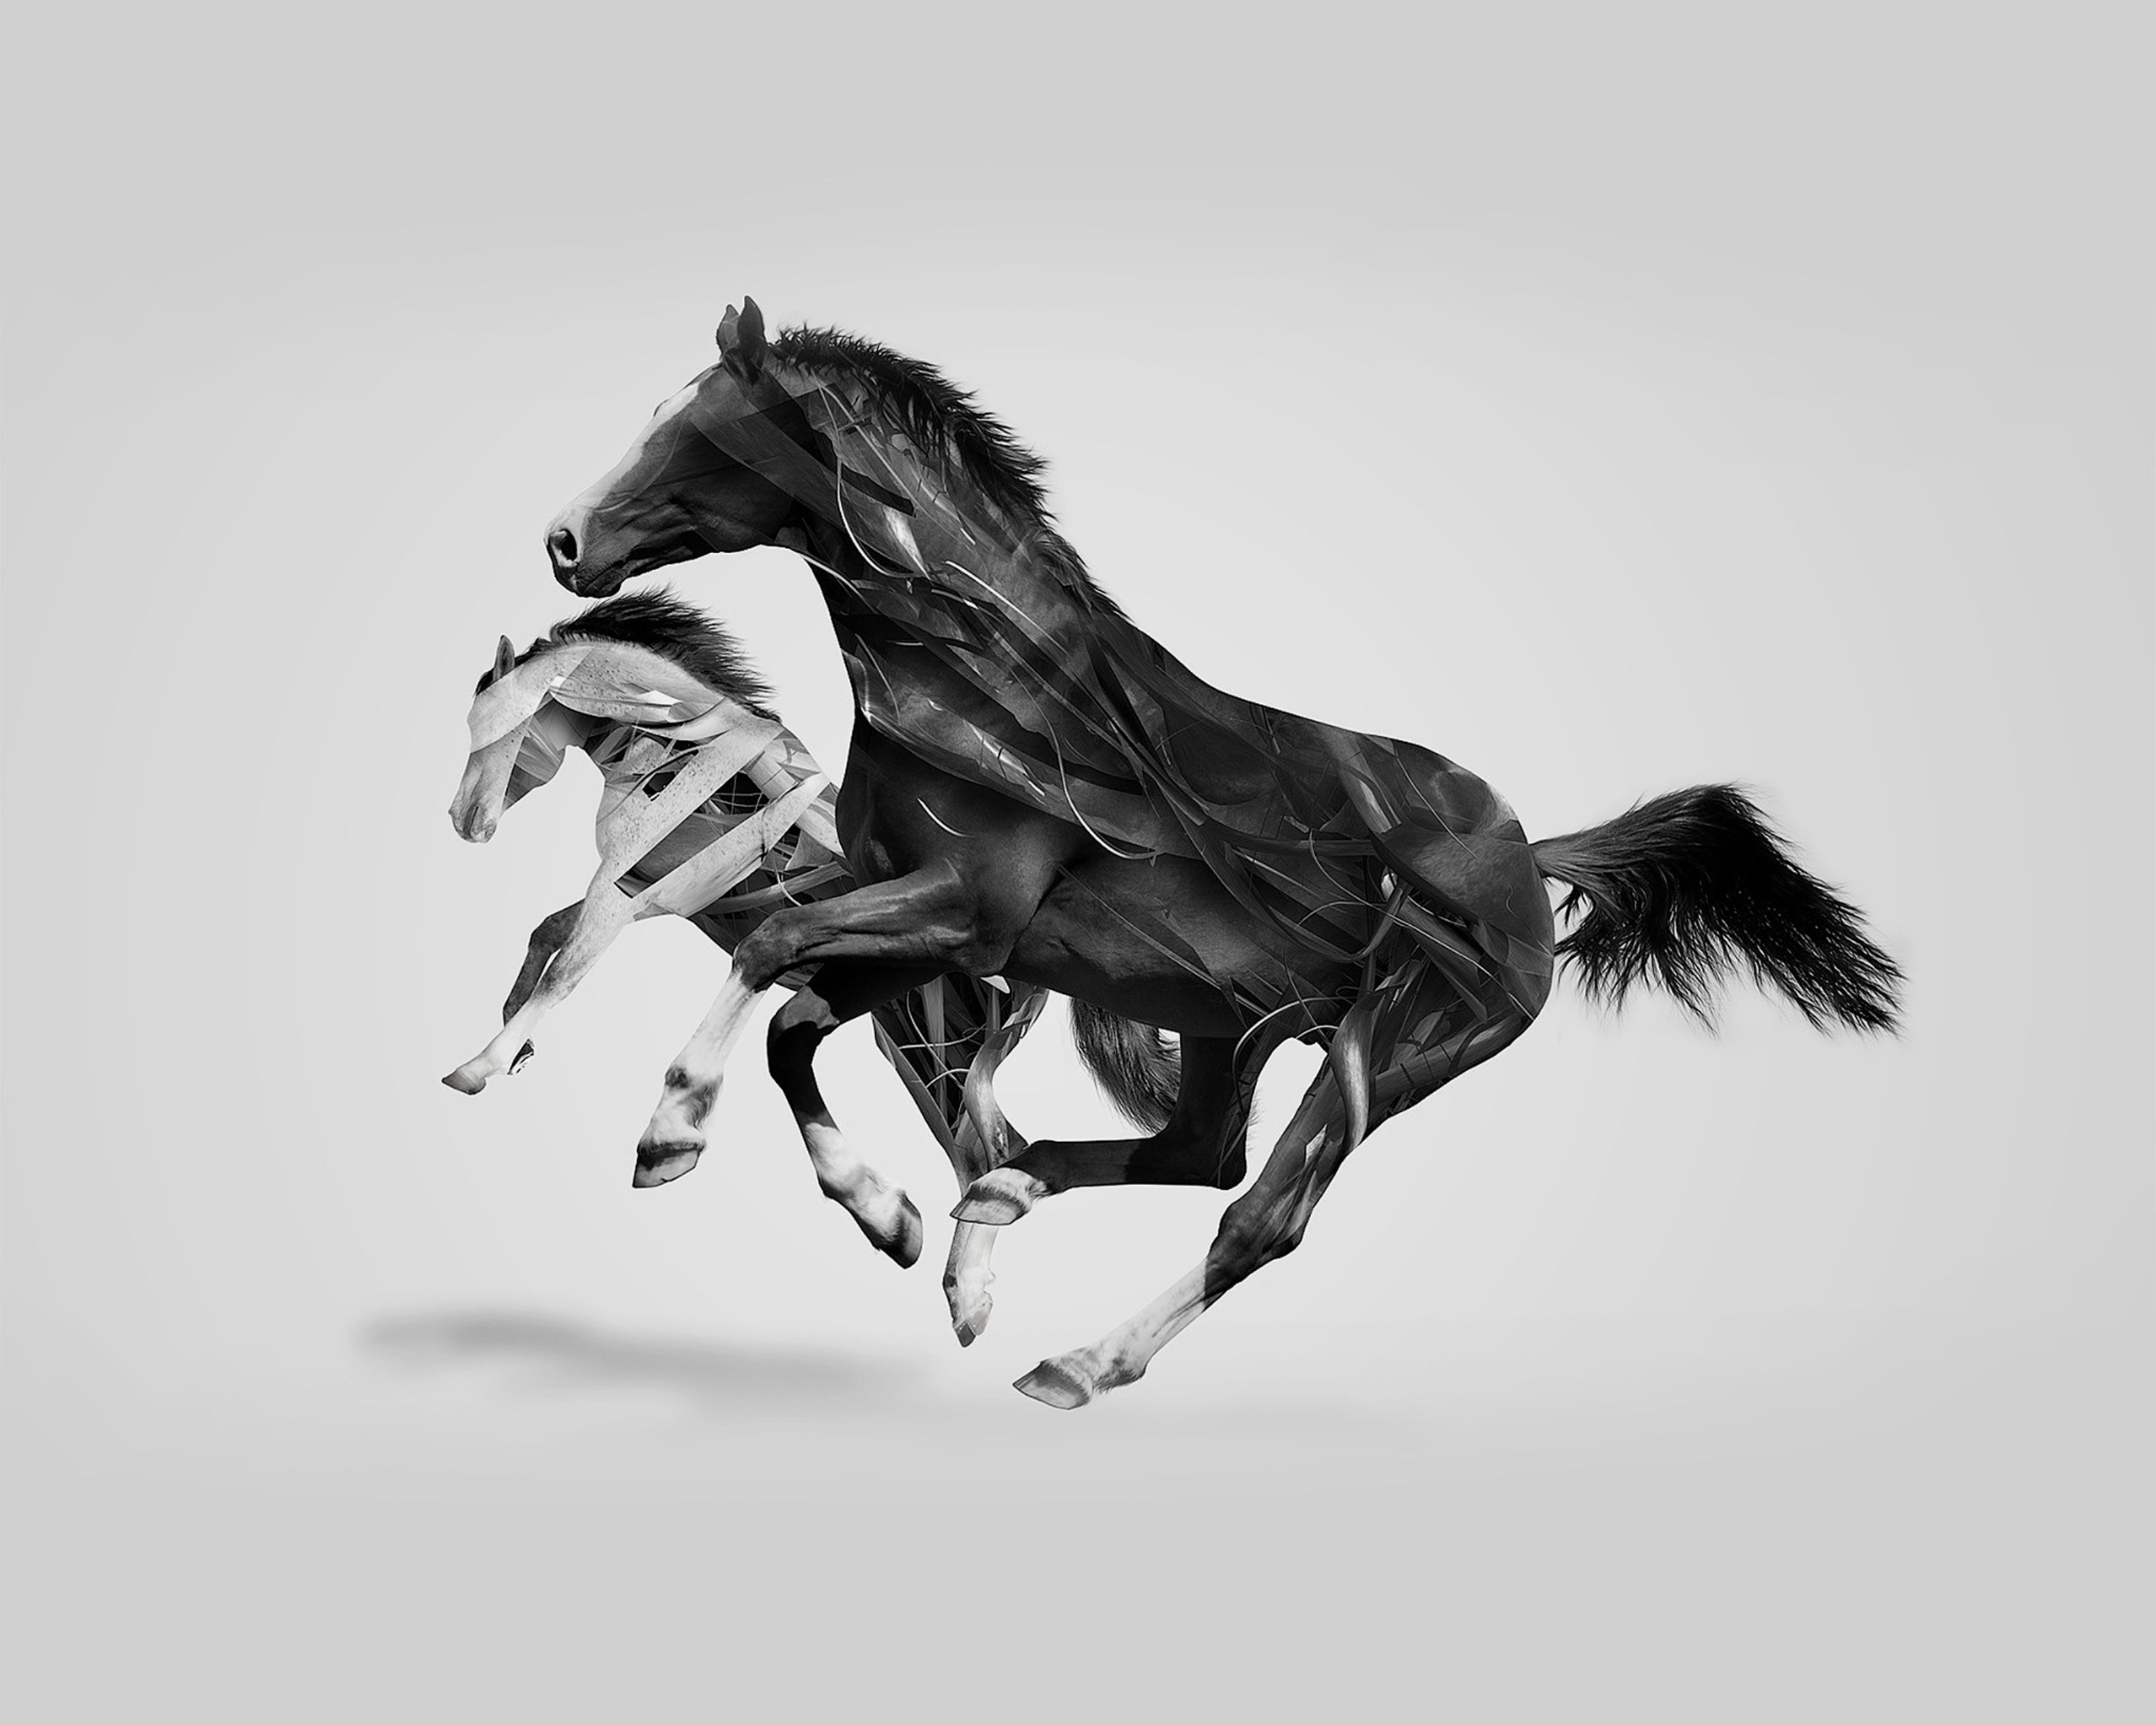 Best Wallpaper Horse Creative - ae04842054c0da0a6a0101ffd1693b67  Image_639218.jpg